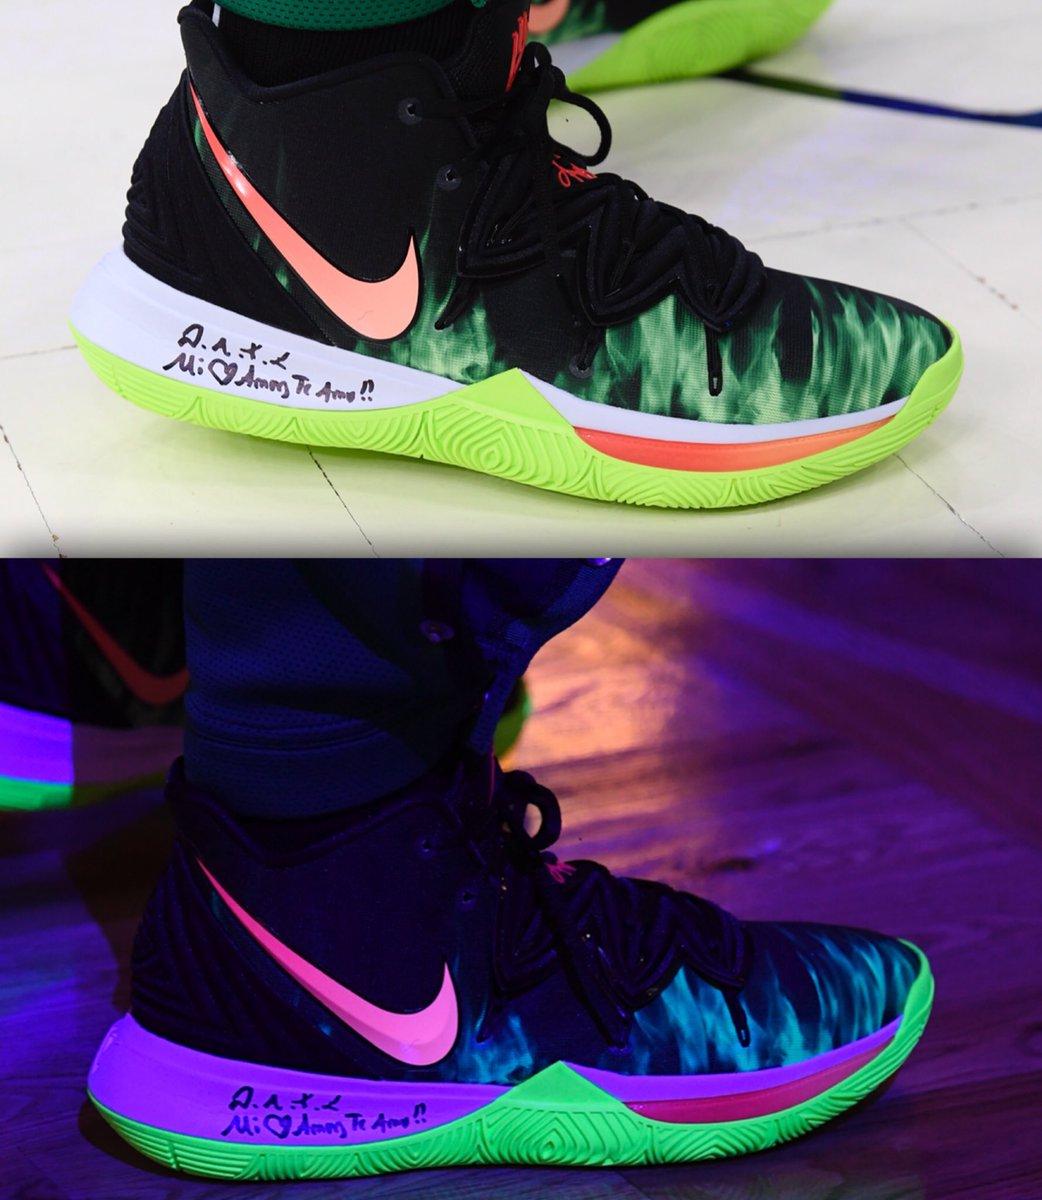 Kyrie with a Glow in the Dark Nike Kyrie 5 tonight! #NBAKicks